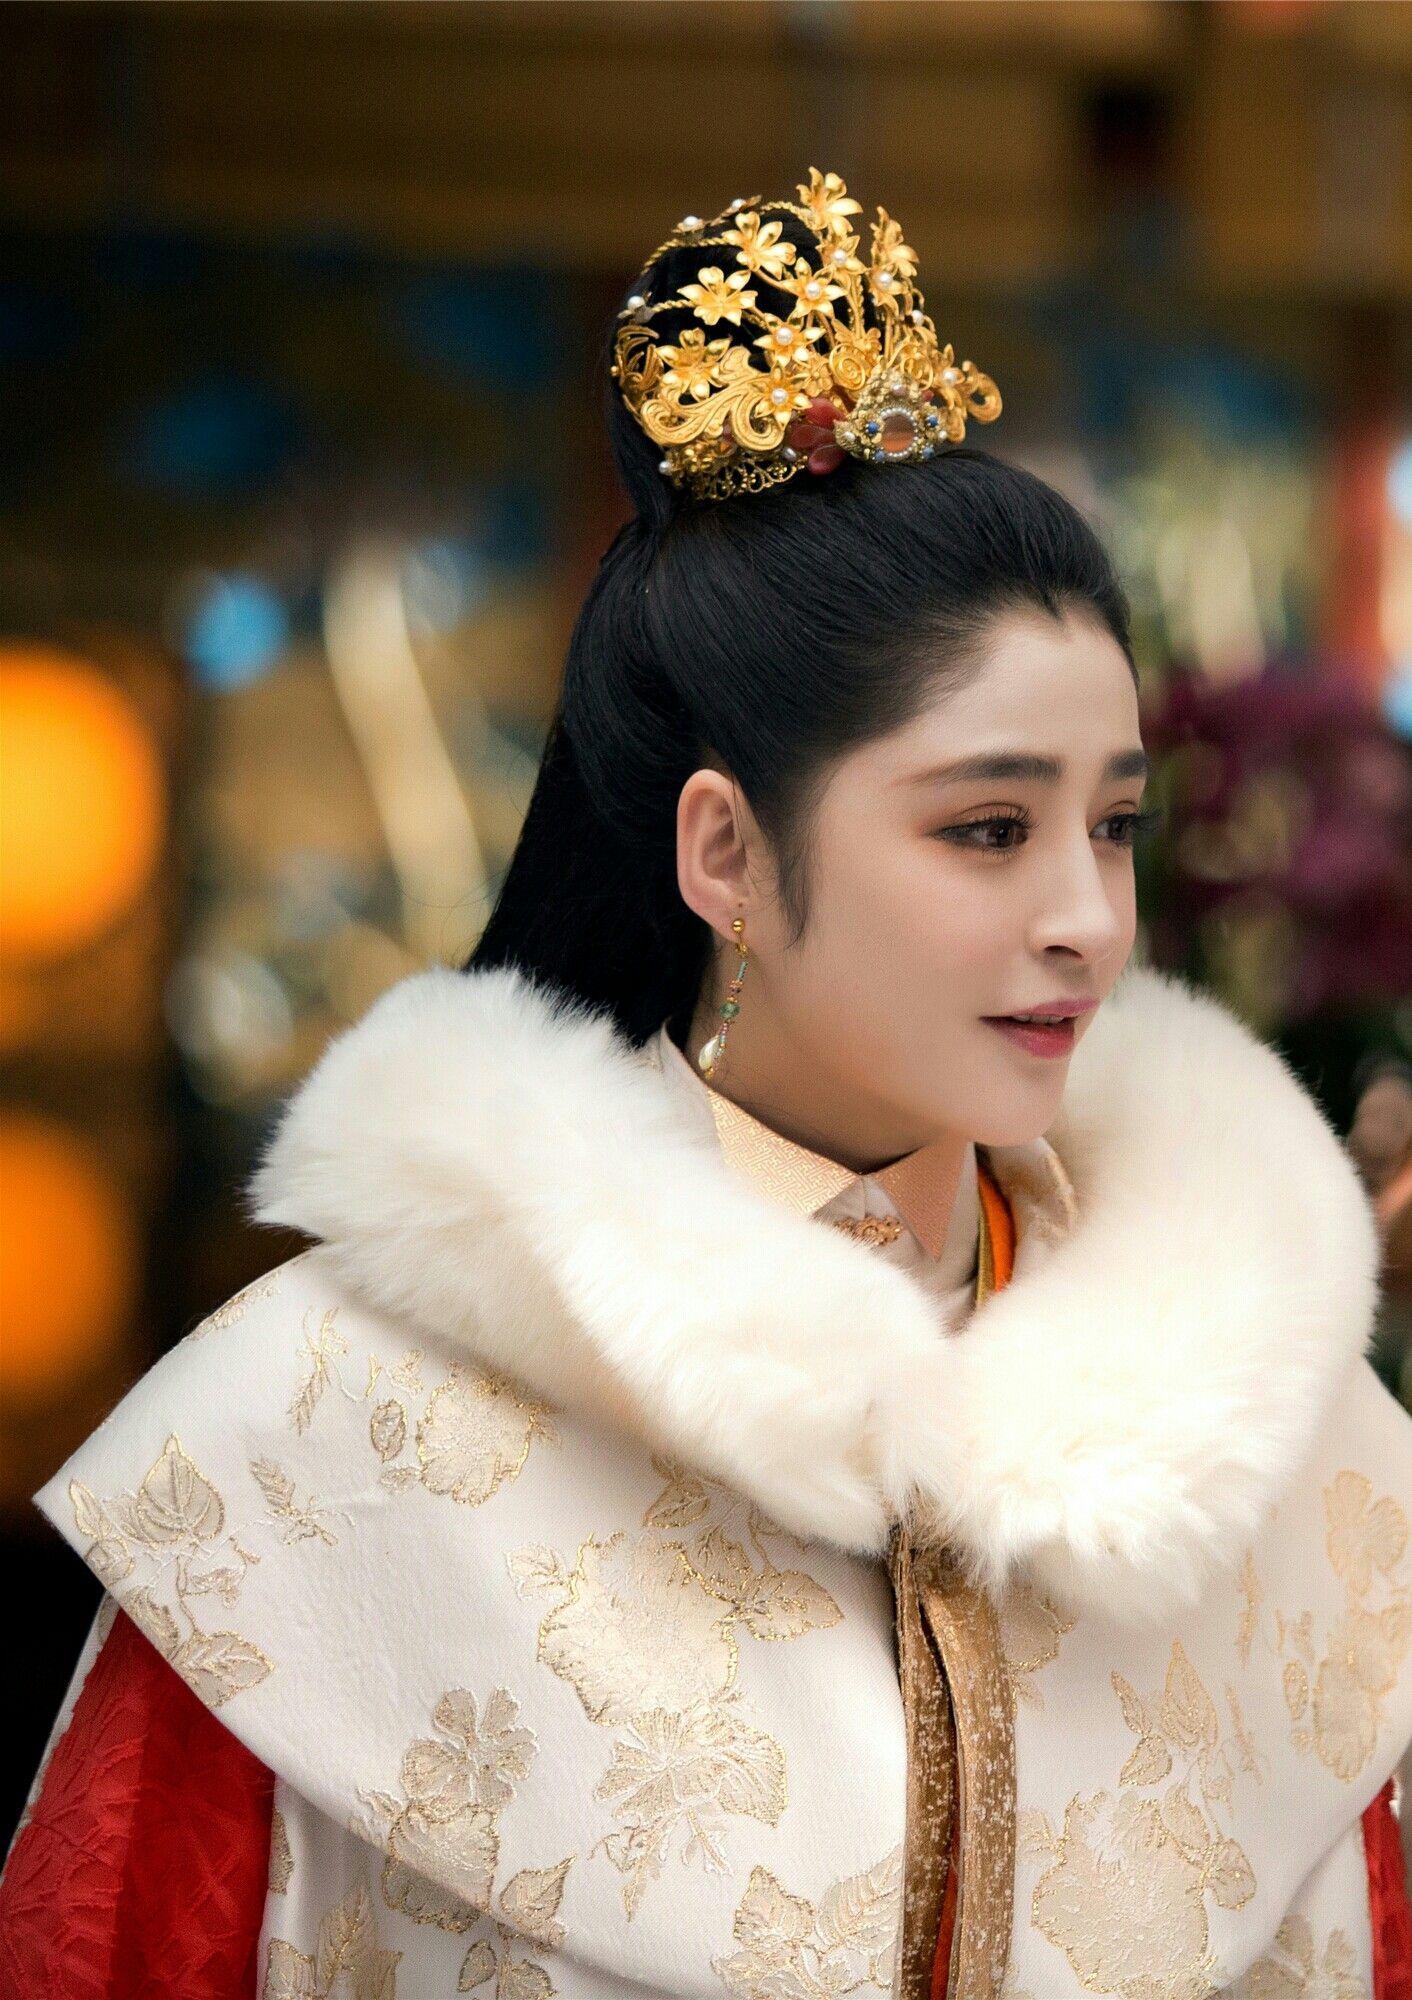 hanfu from the princess weiyoung 《锦绣未央》 - tang yan, luo jin